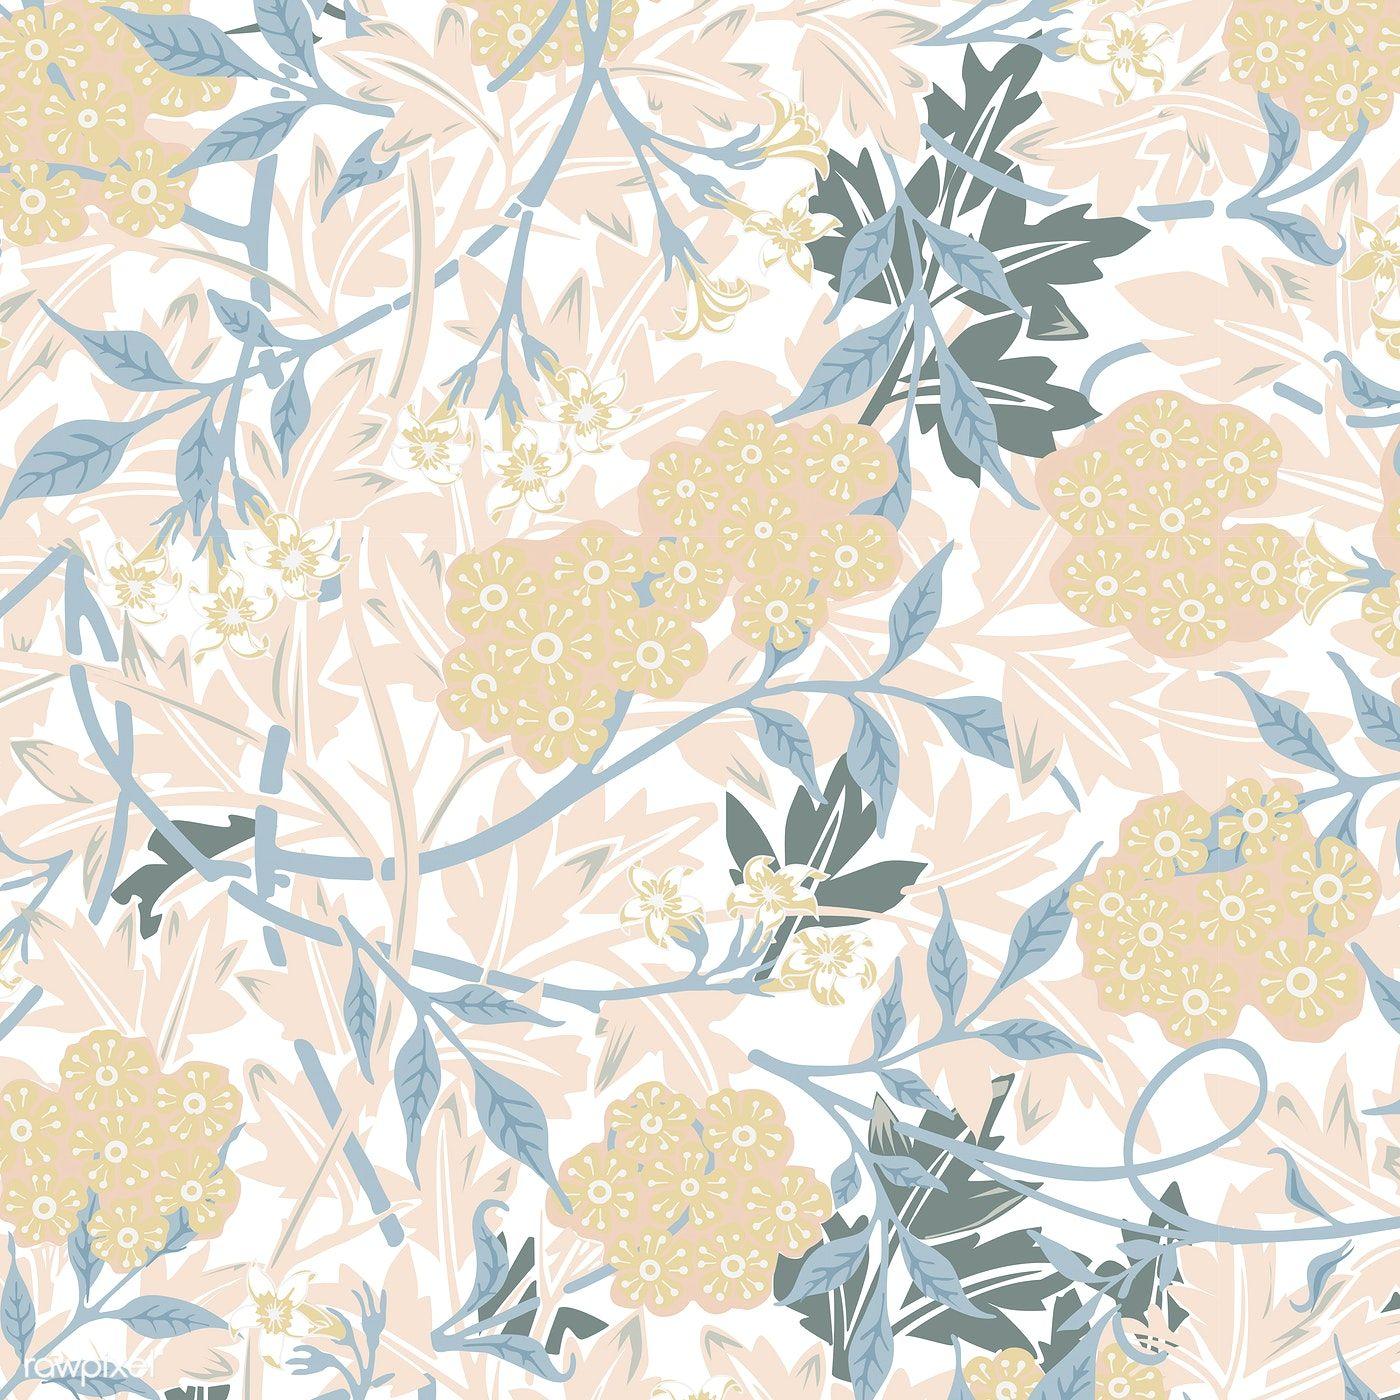 Download Premium Vector Of Vintage Illustration Of Jasmine 496147 Vintage Illustration Illustration Wall Art William Morris Patterns